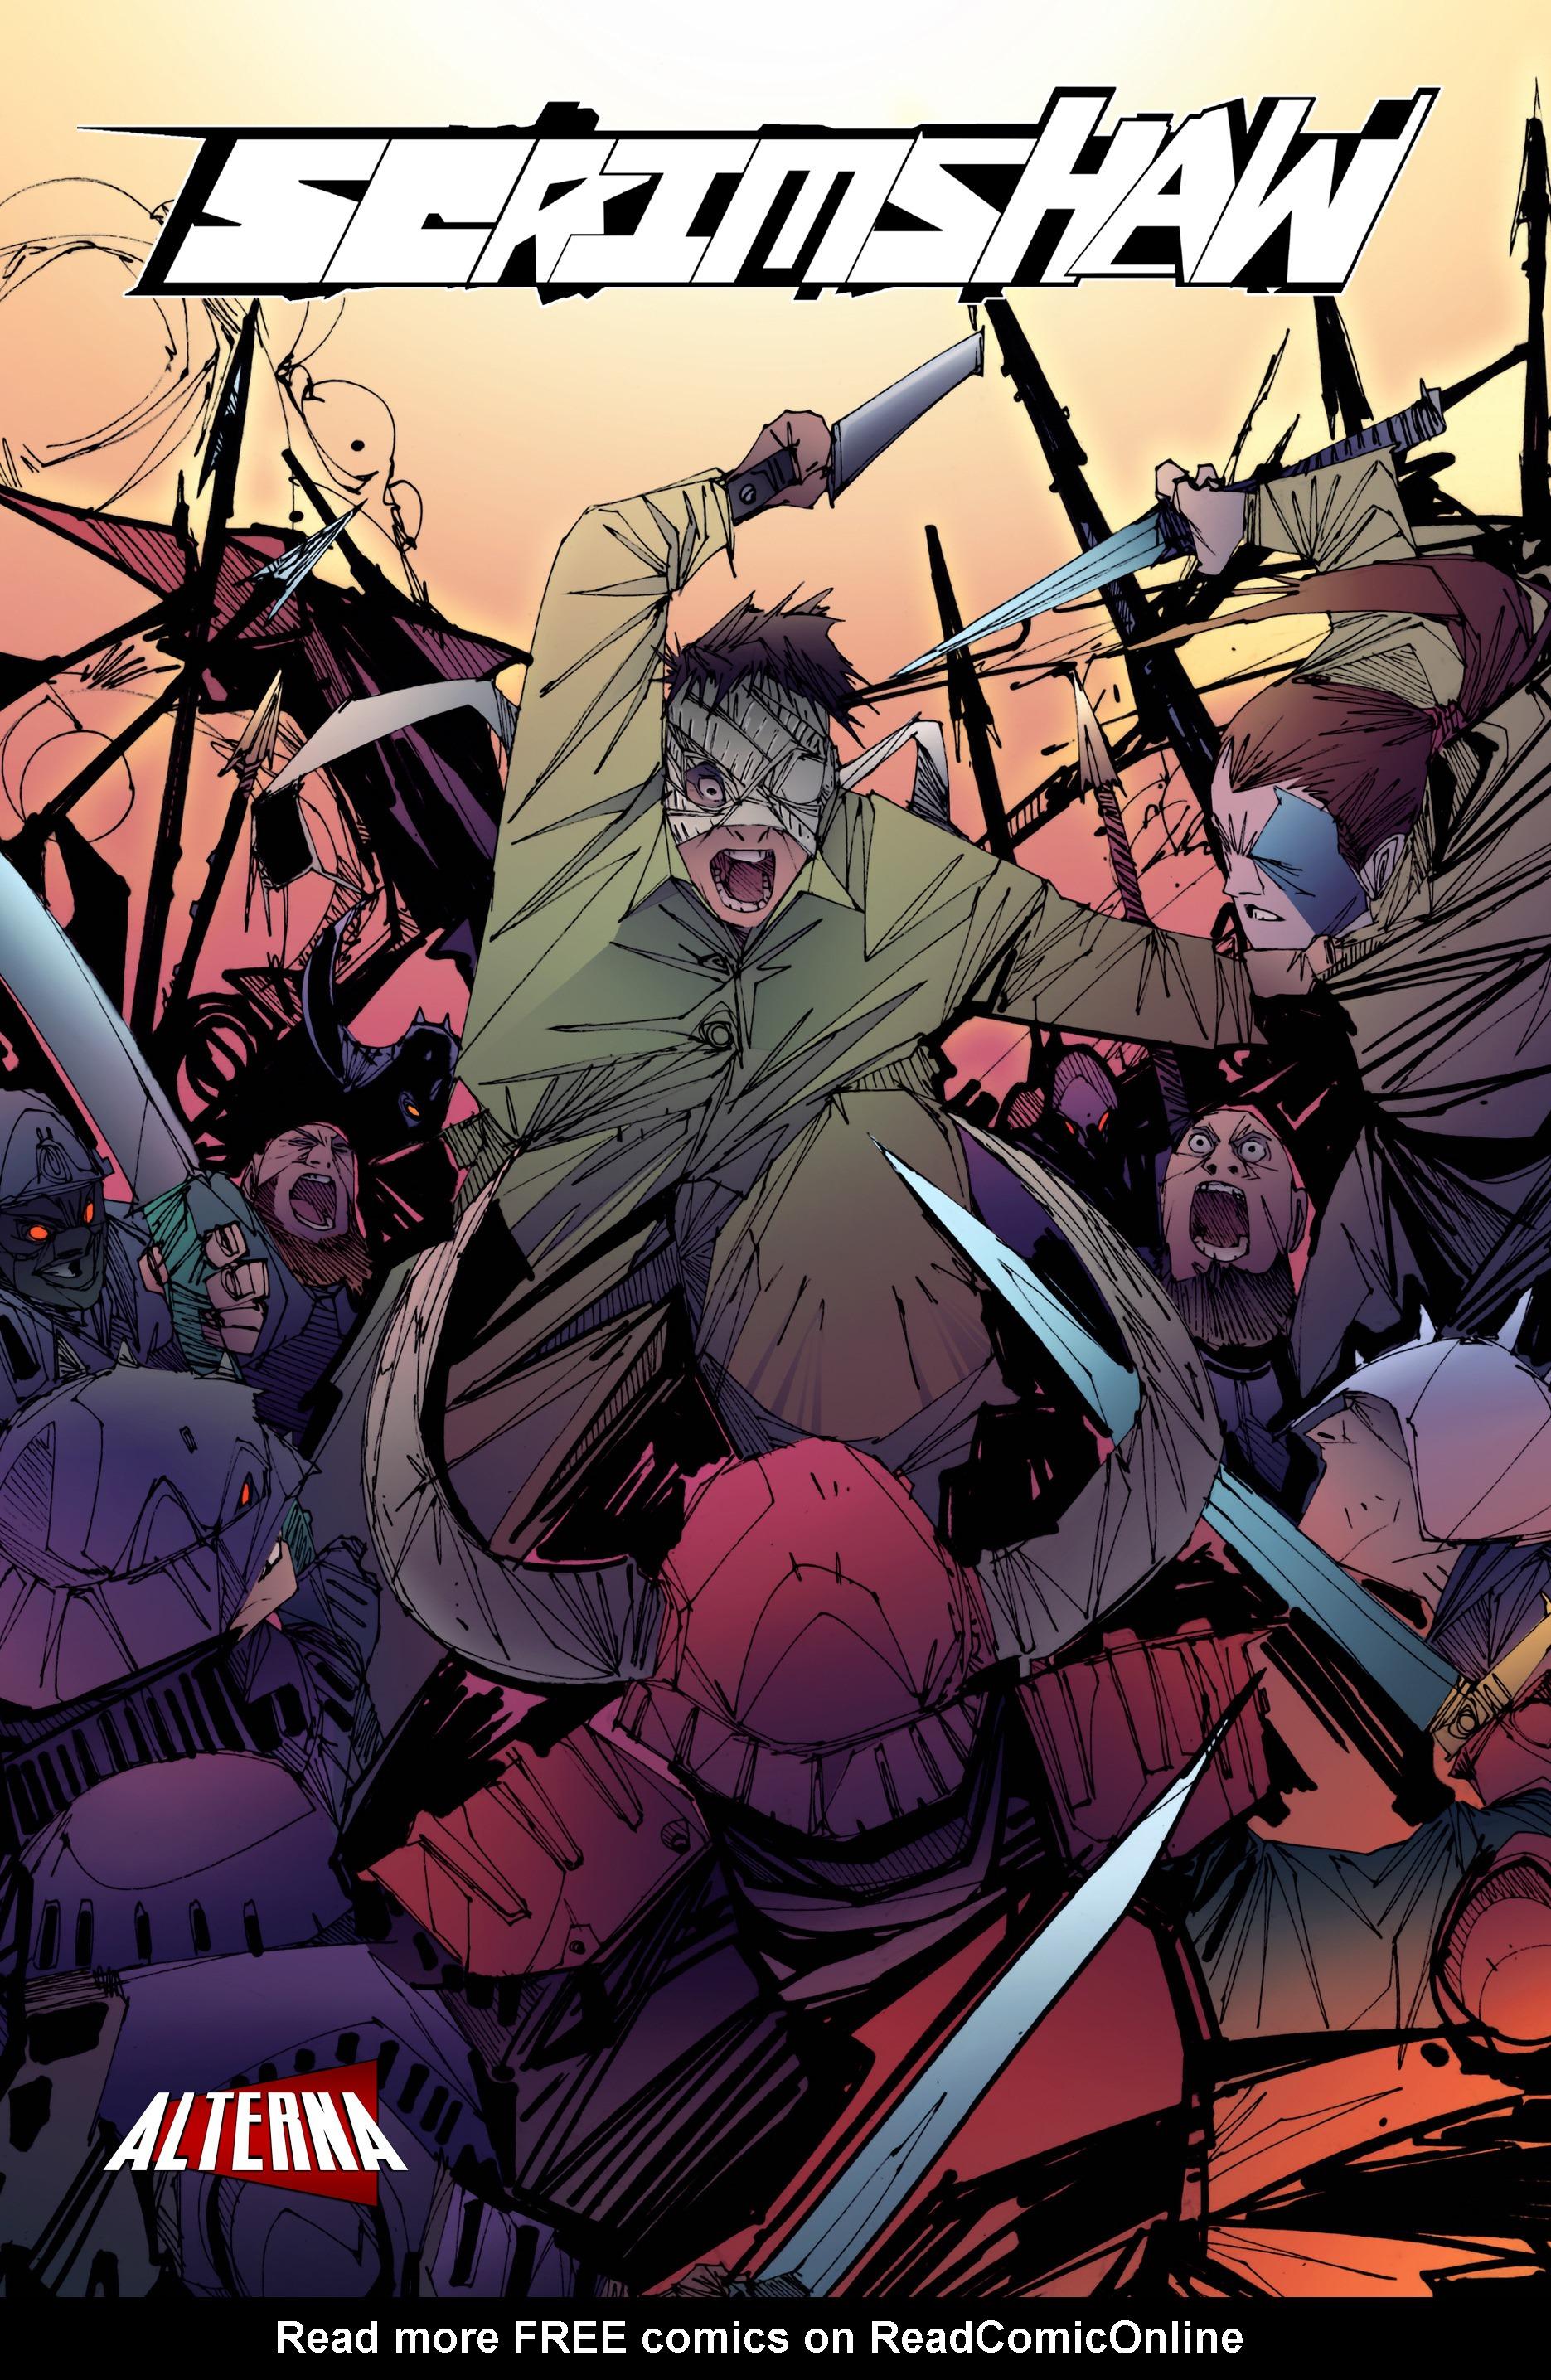 Read online Scrimshaw comic -  Issue #2 - 1